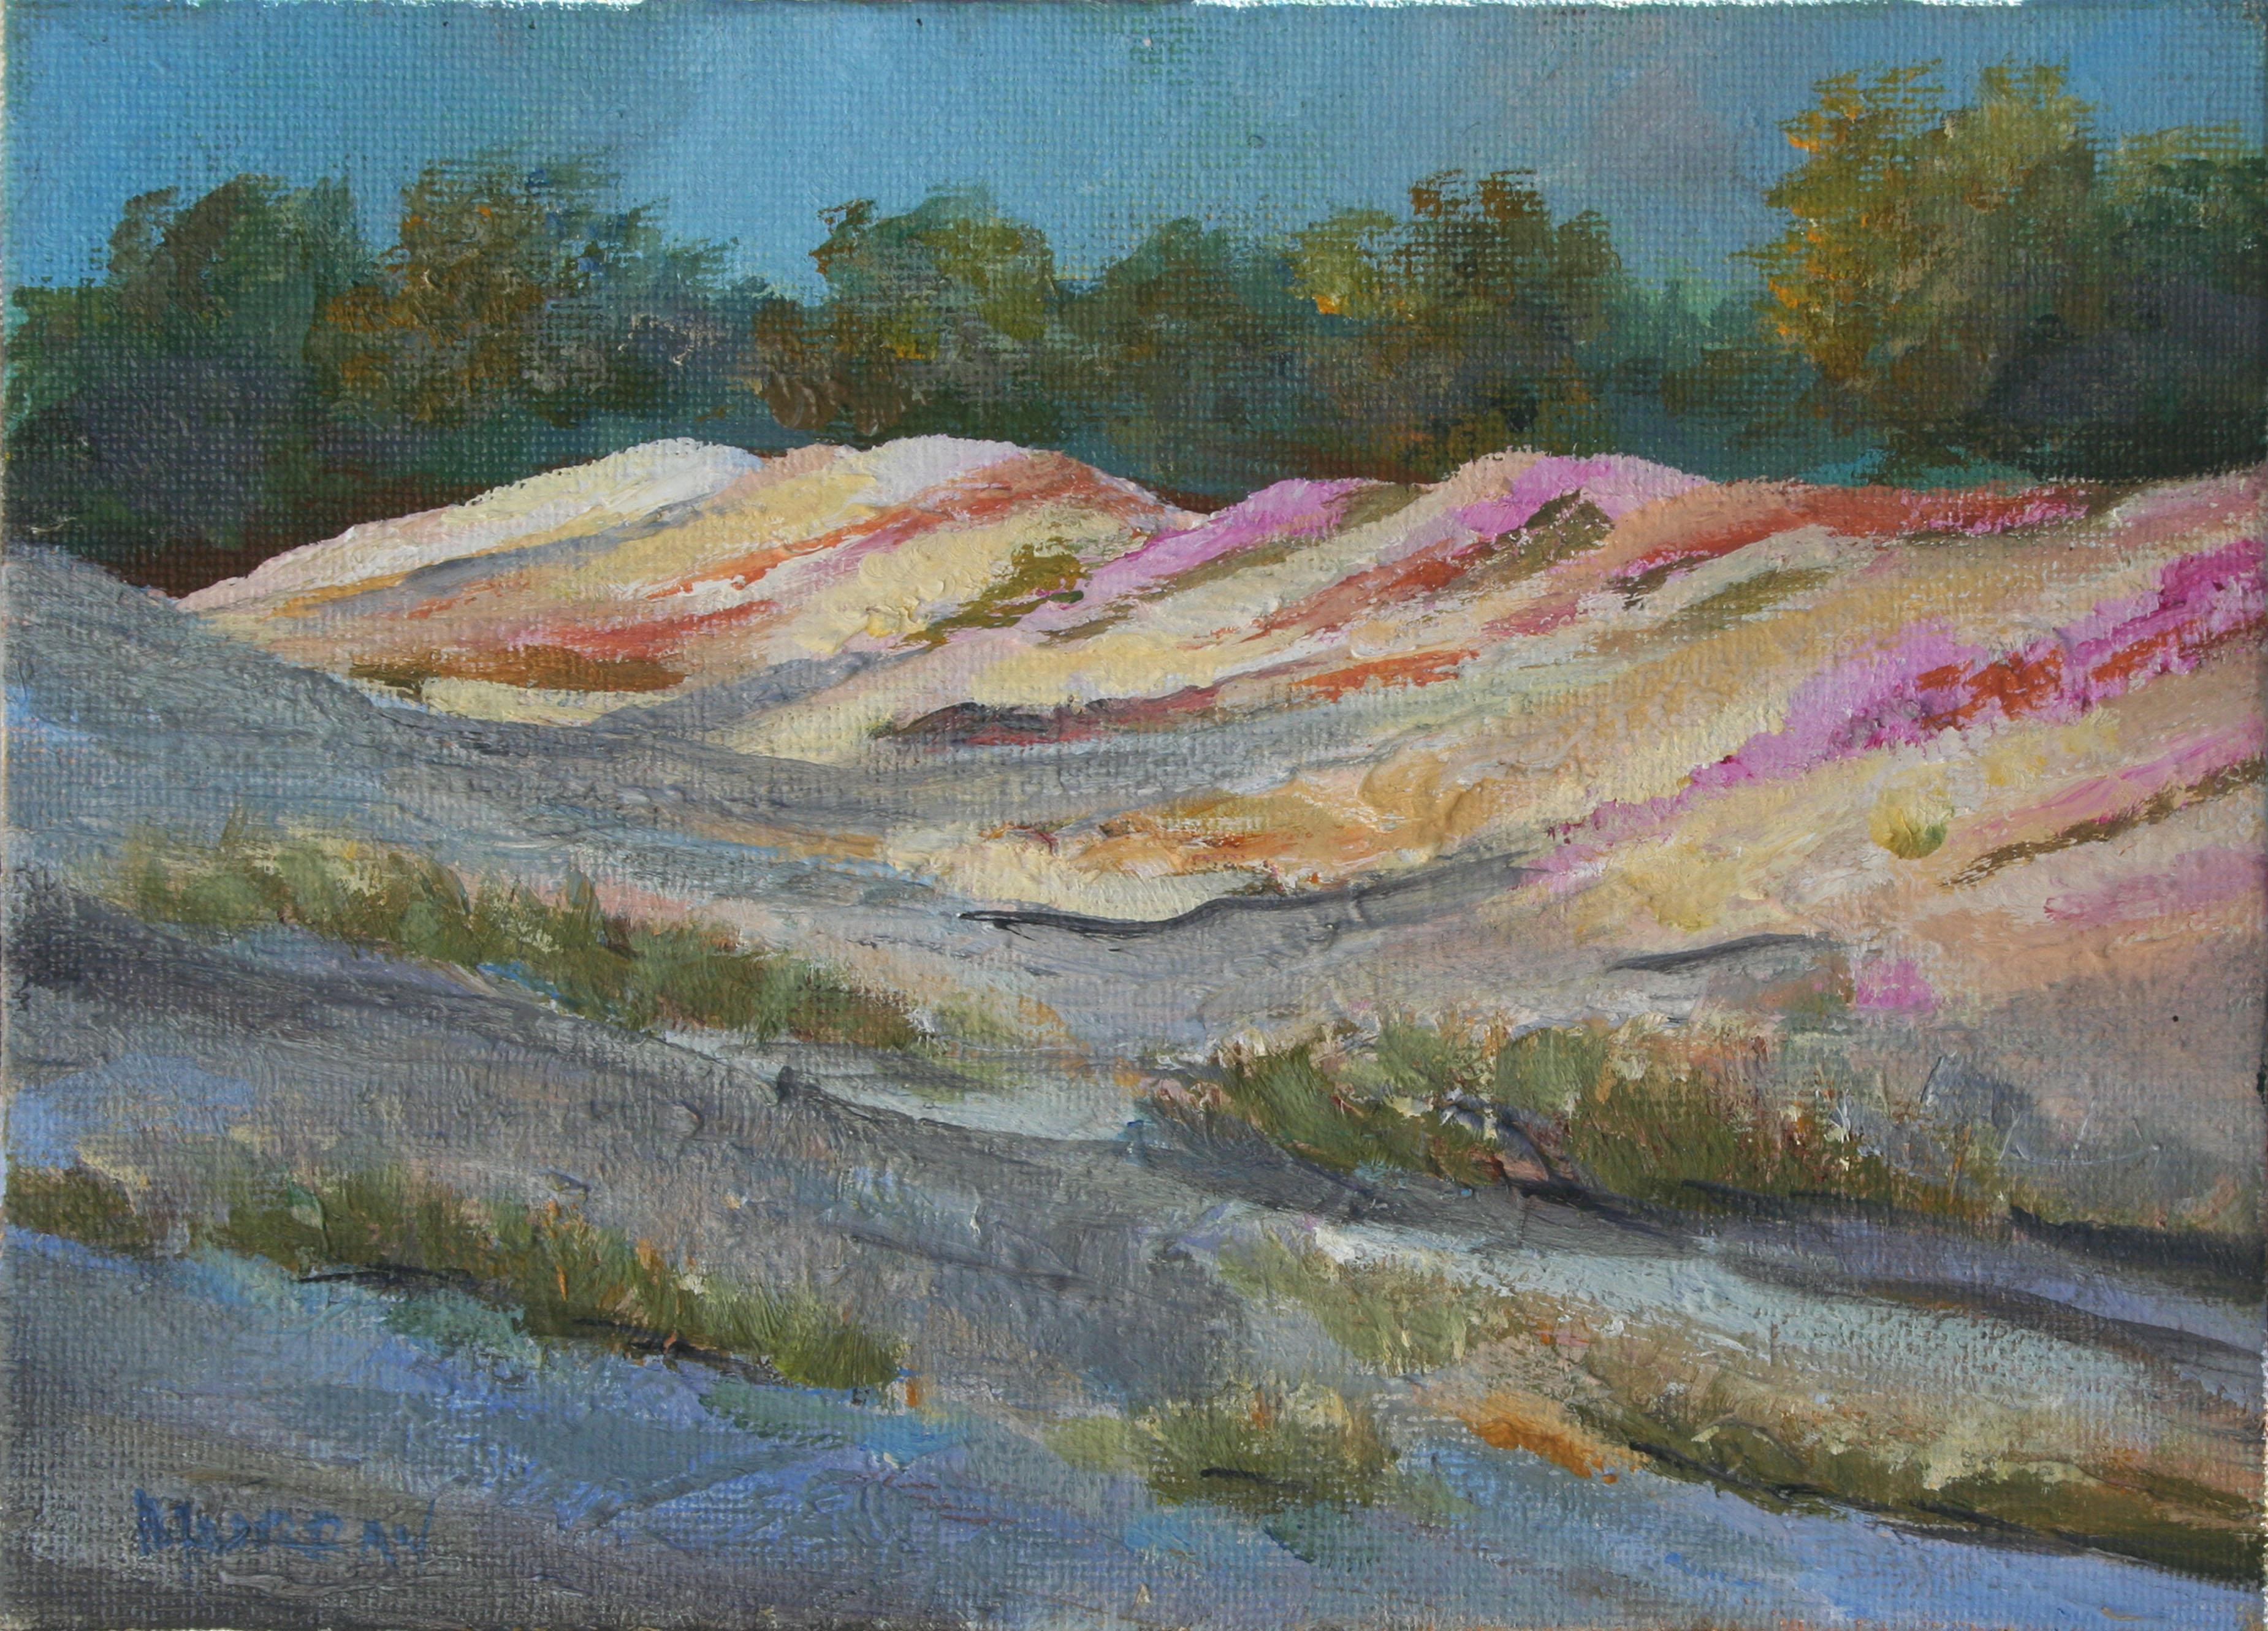 Sand Dunes and Ice Plants - Monterey Landscape